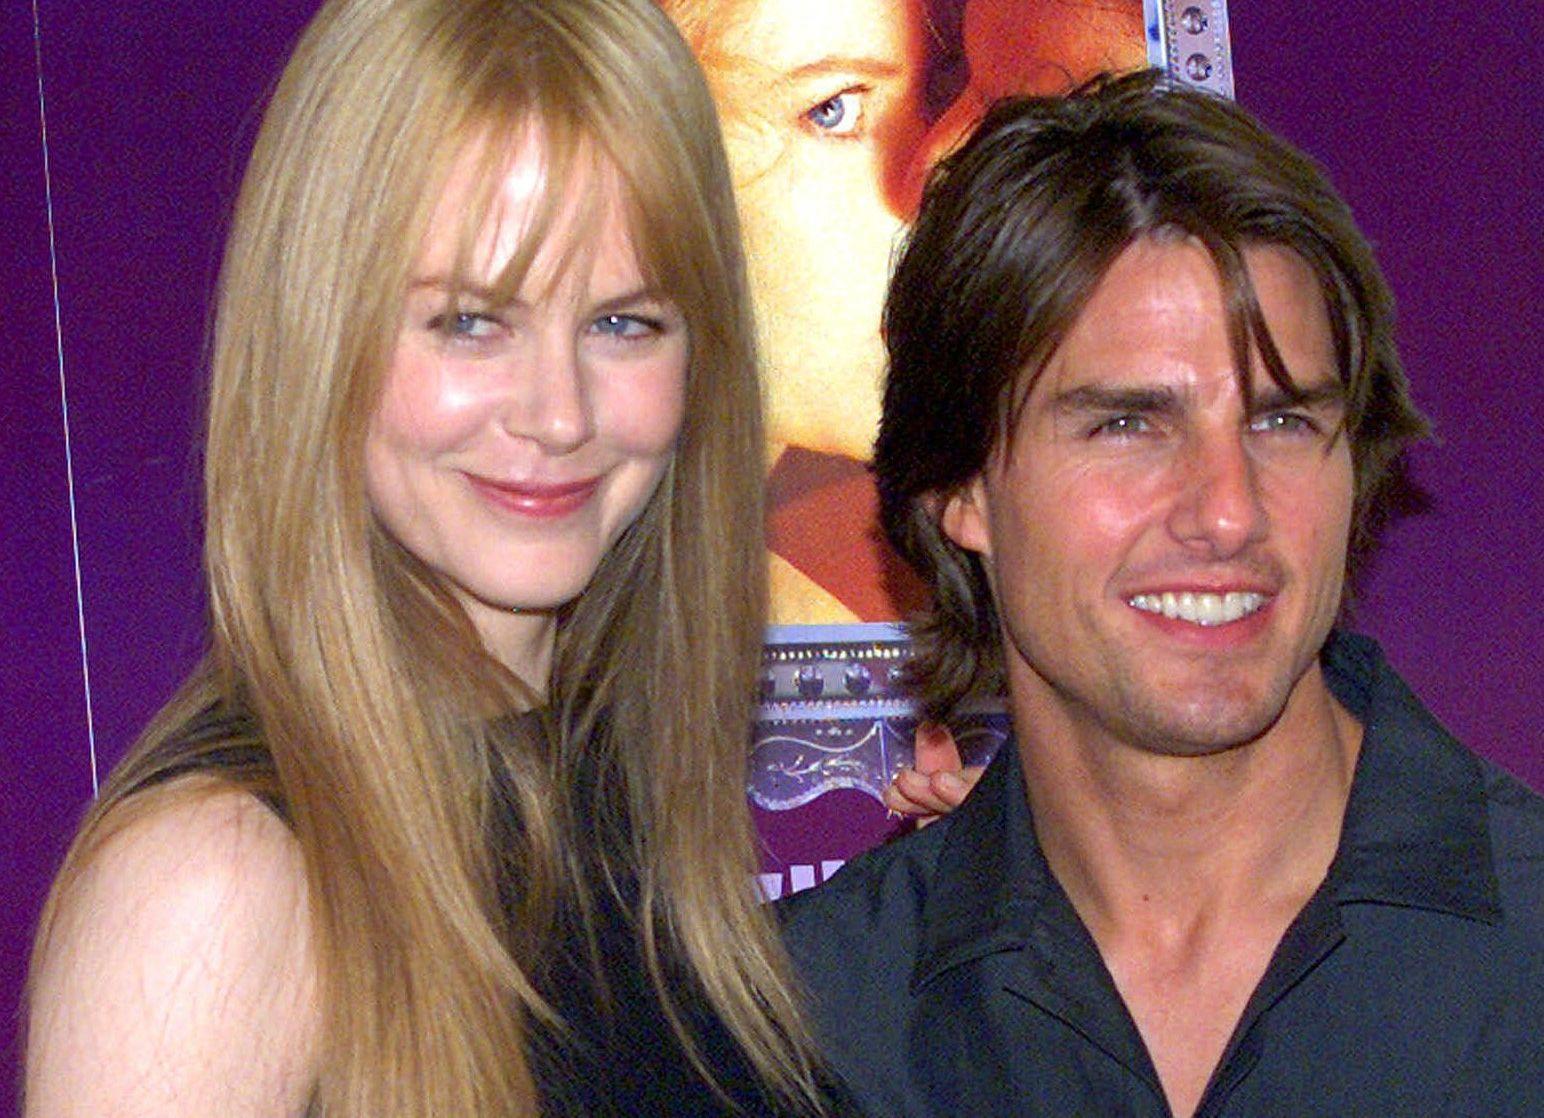 EKSPAR: Nicole Kidman og Tom Cruise på en pressekonferanse i Tokyo i 1999 – like før bruddet.